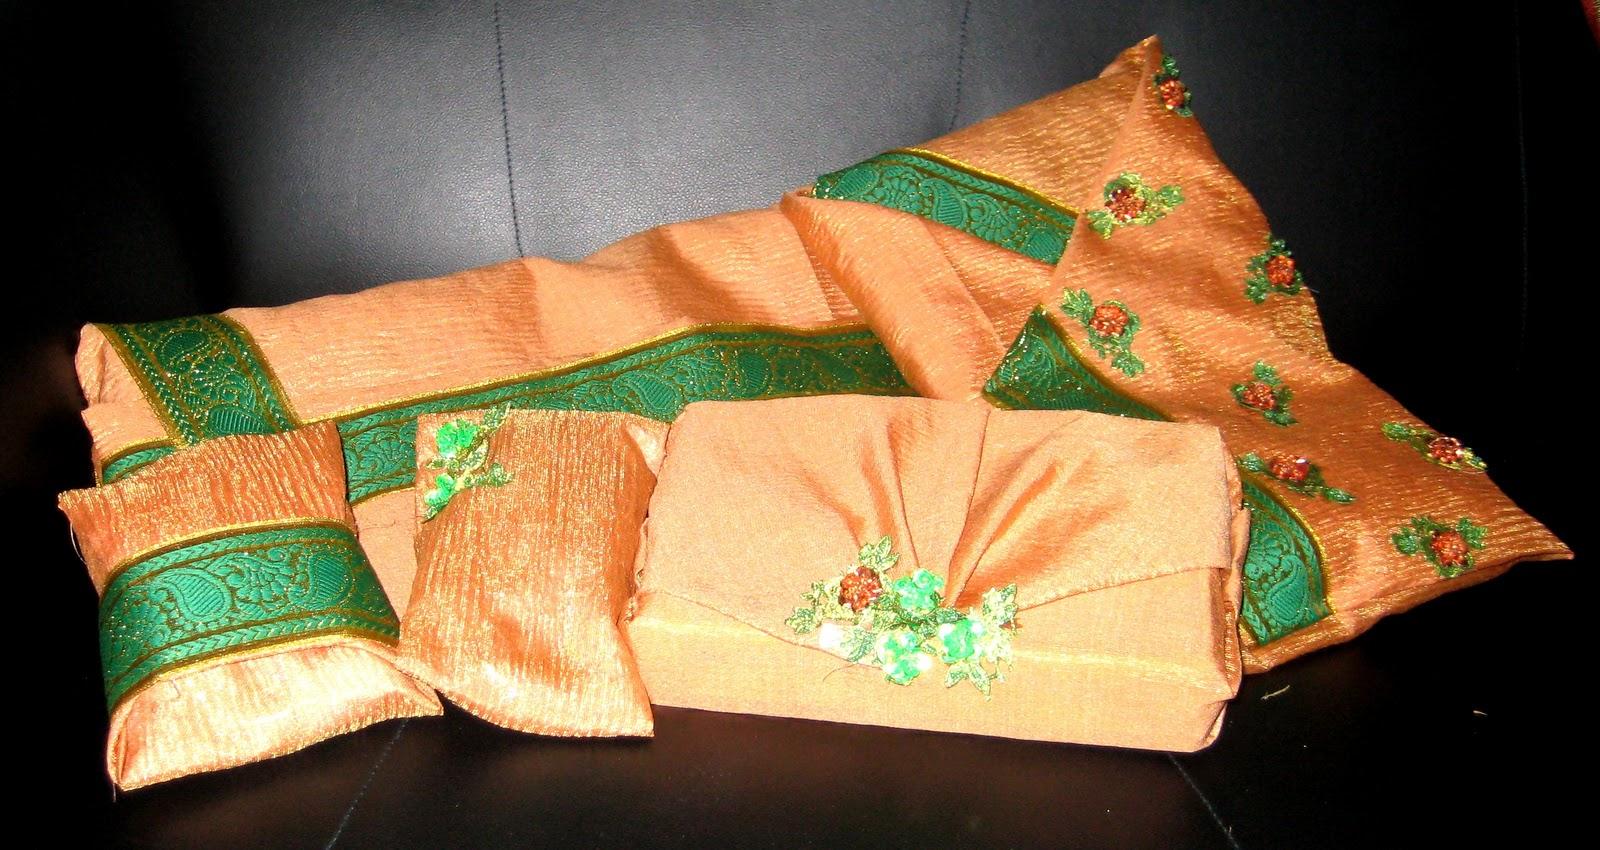 crossdressed in my aunts saree